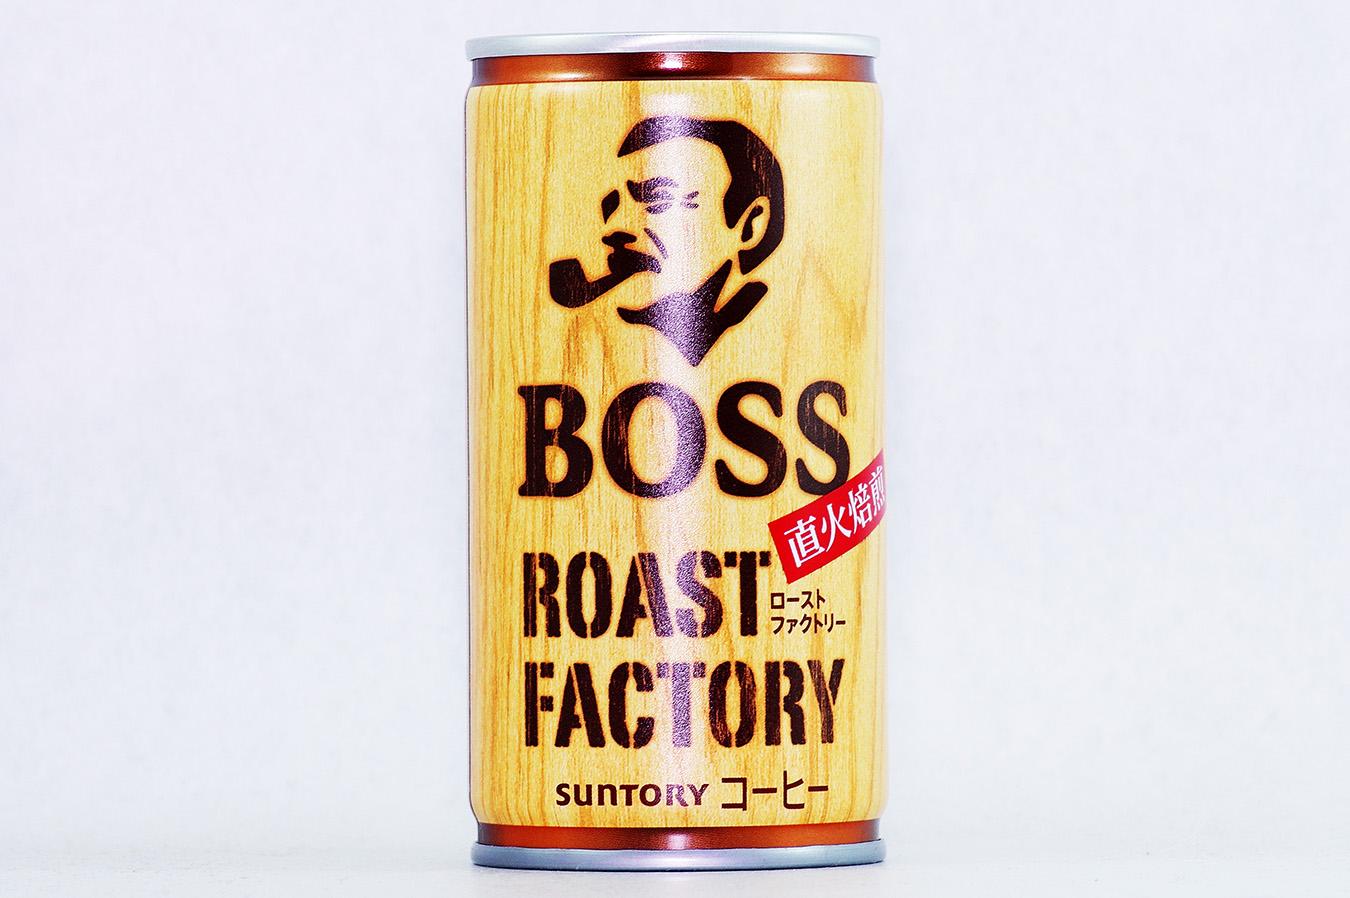 BOSS ローストファクトリー